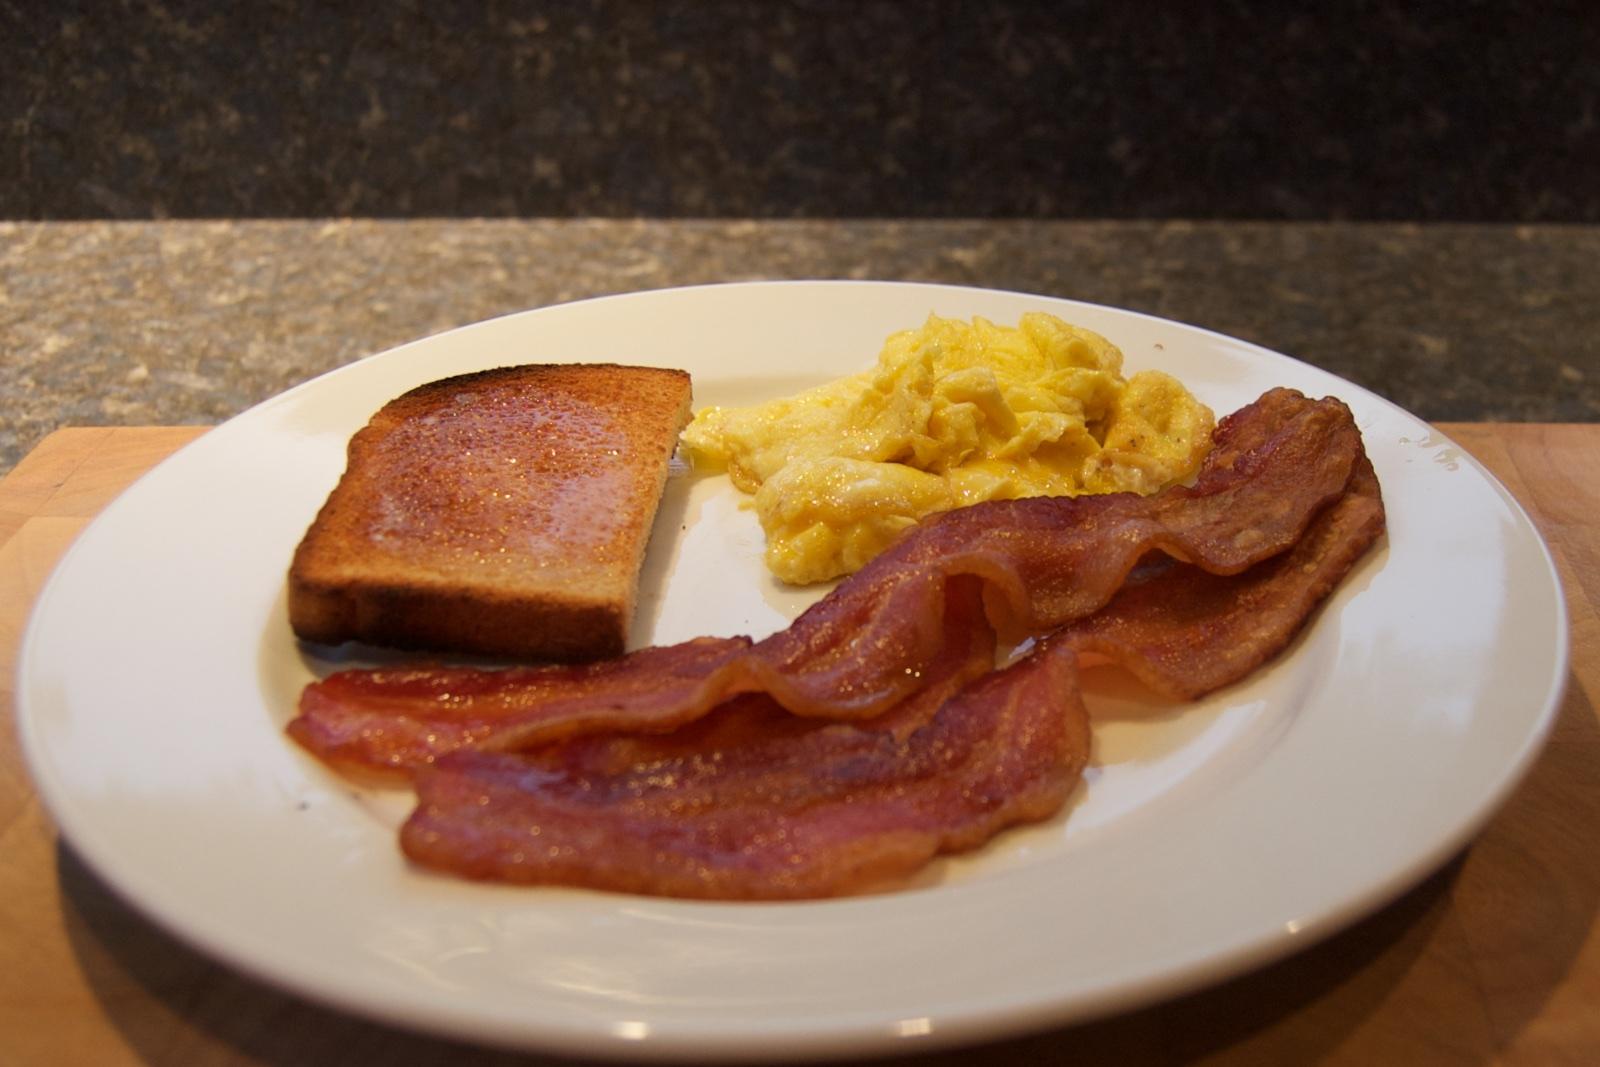 http://blog.rickk.com/food/2015/07/20/ate.2015.07.20.b.jpg